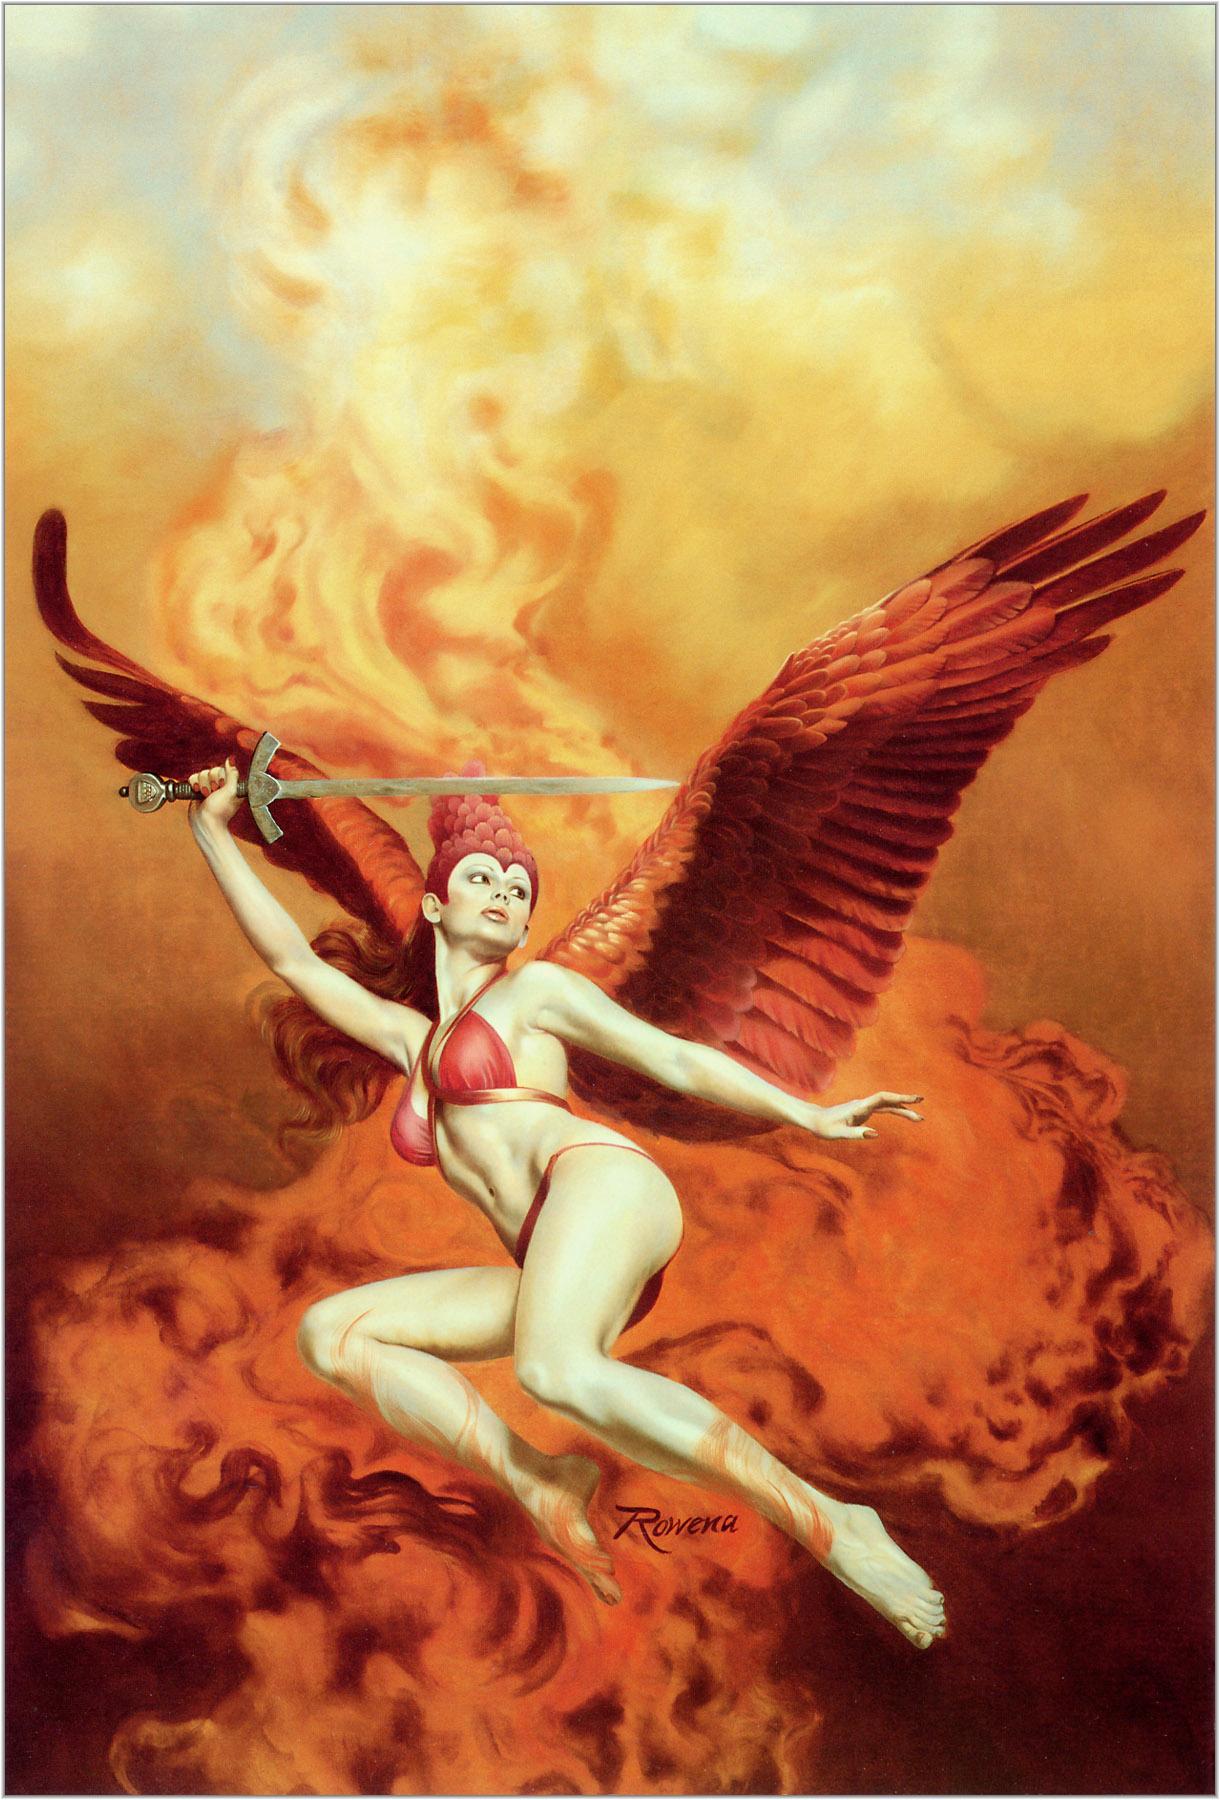 Rowena_Morrill_Flame_Goddess